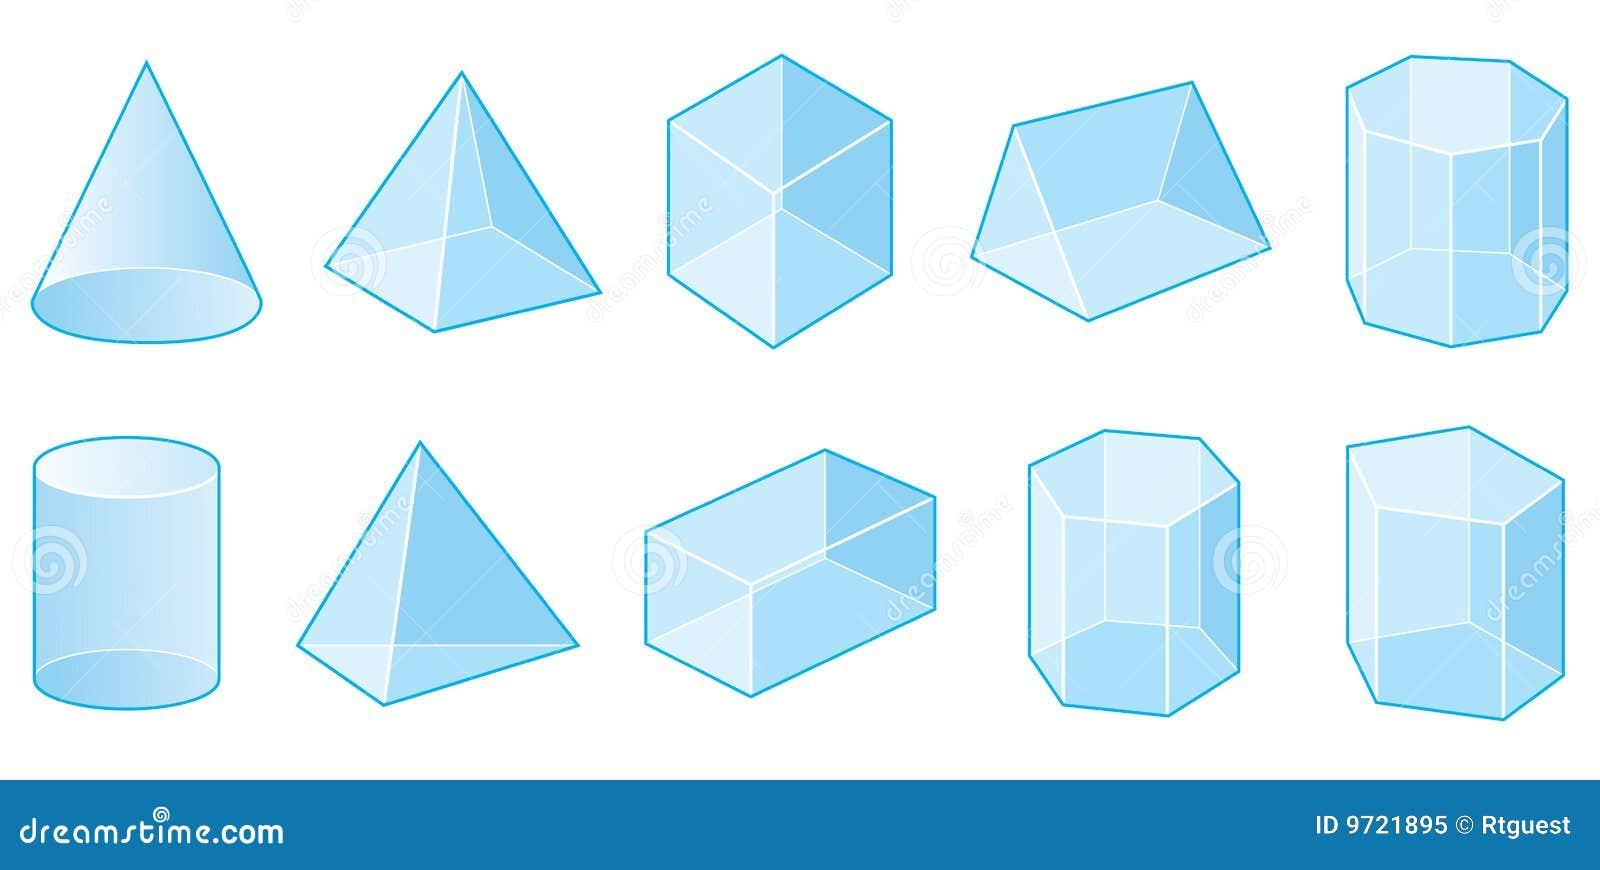 geometrische formen lizenzfreies stockfoto bild 9721895. Black Bedroom Furniture Sets. Home Design Ideas